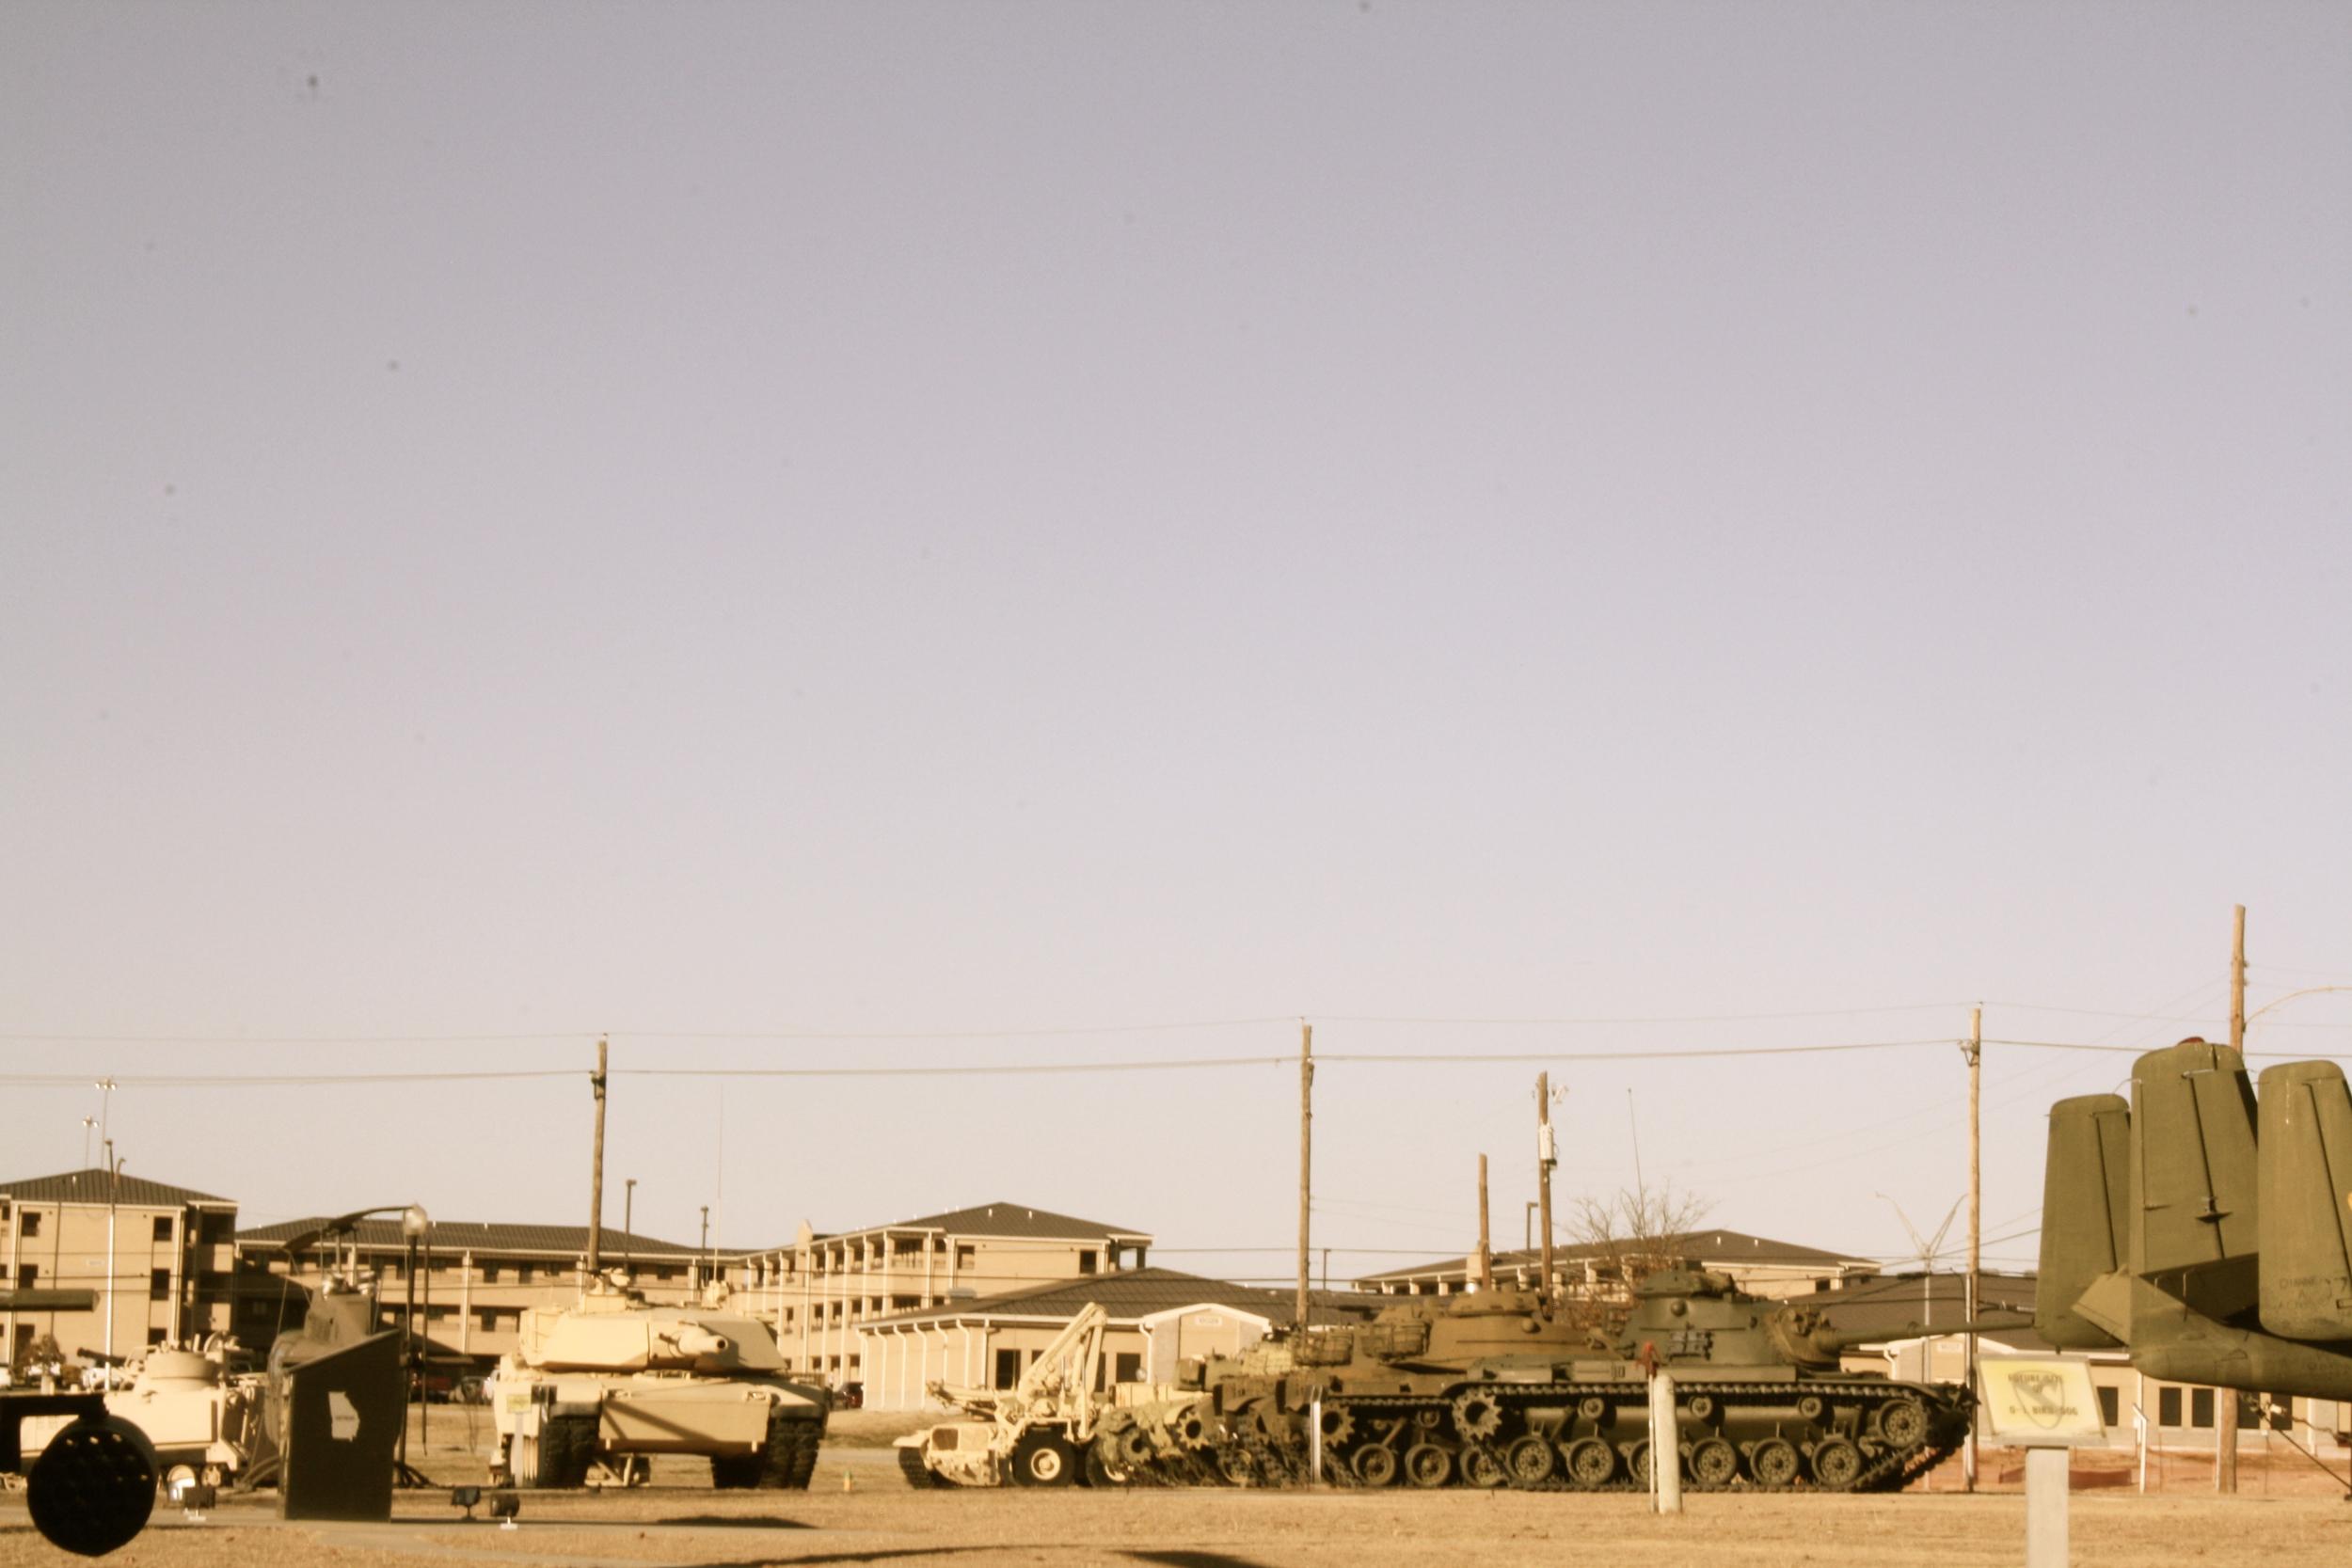 Barracks and Tanks, Fort Hood Military Base